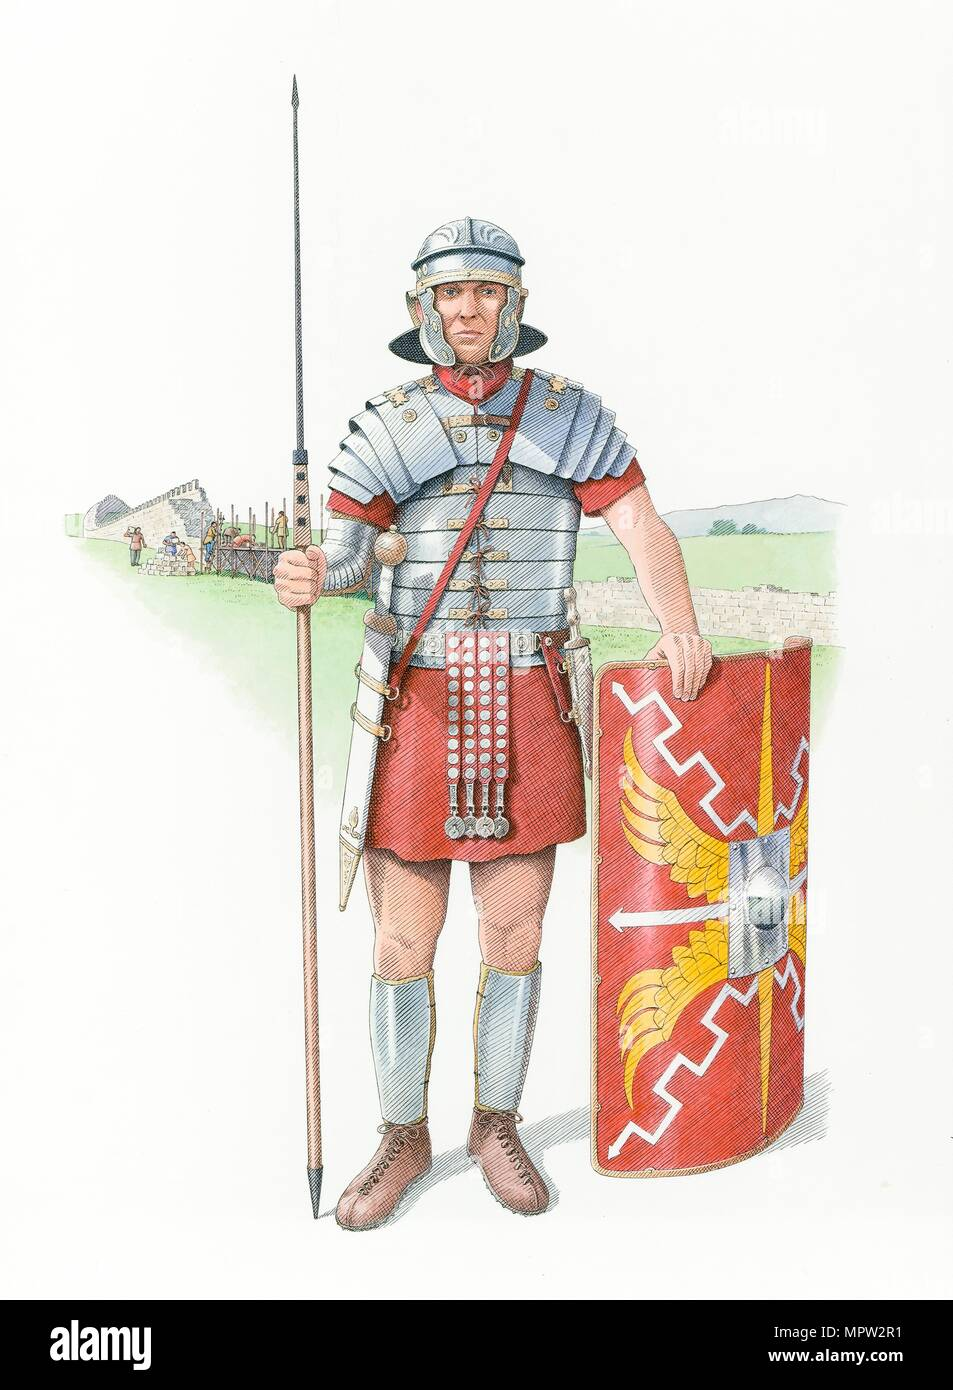 Legionario romano soldato, c120 (2014). Artista: Nick Hardcastle. Immagini Stock